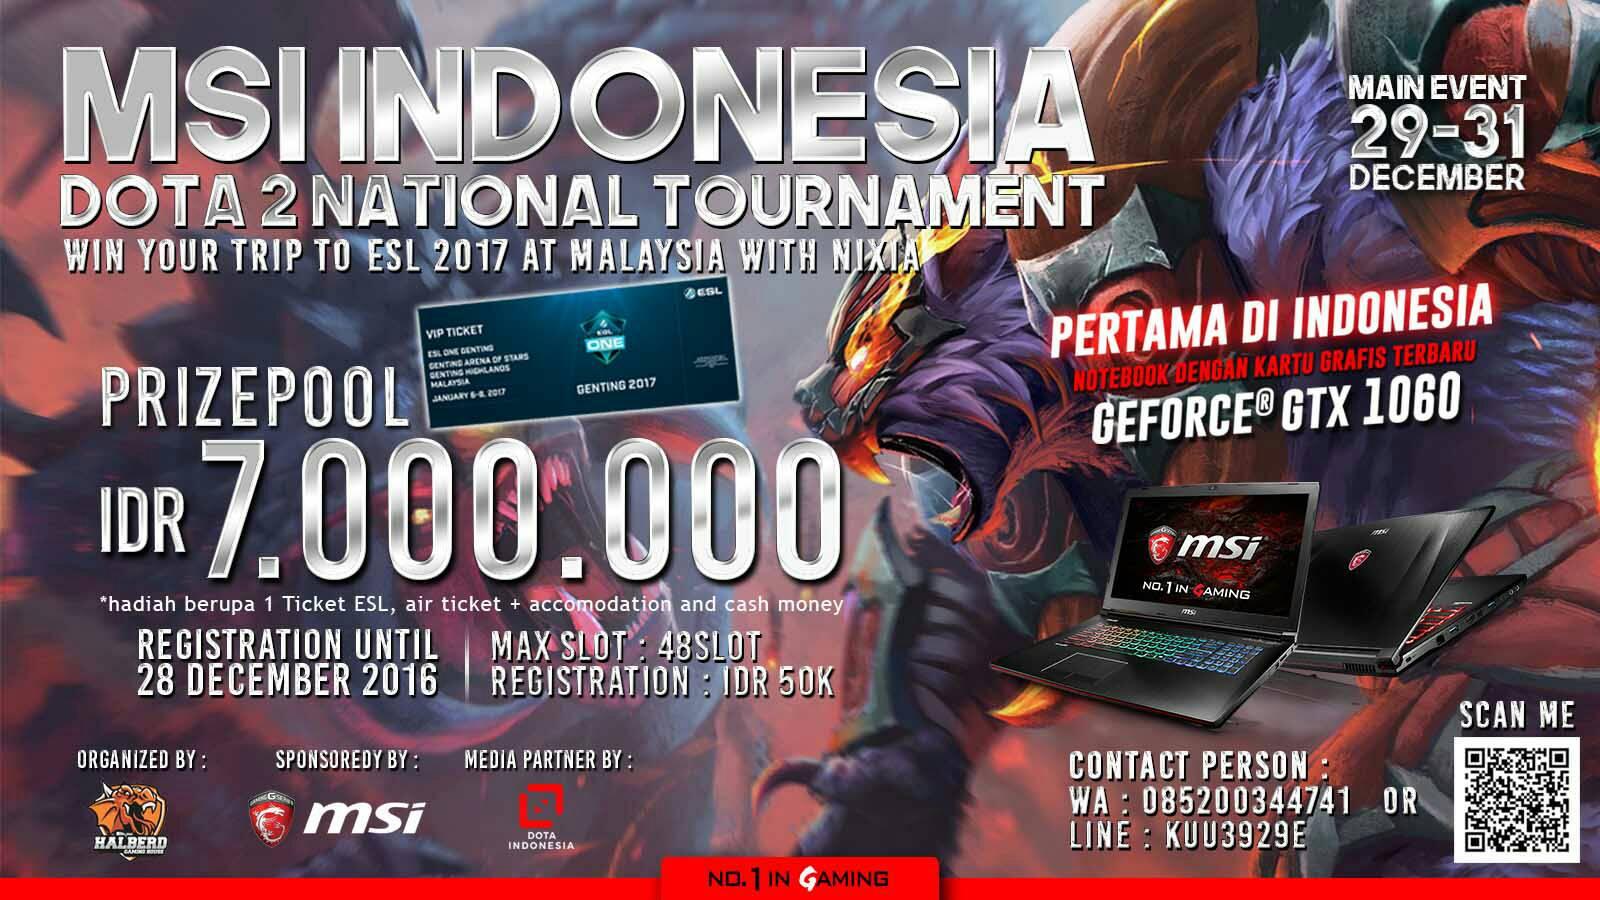 msi indonesia dota 2 national tournament msi global